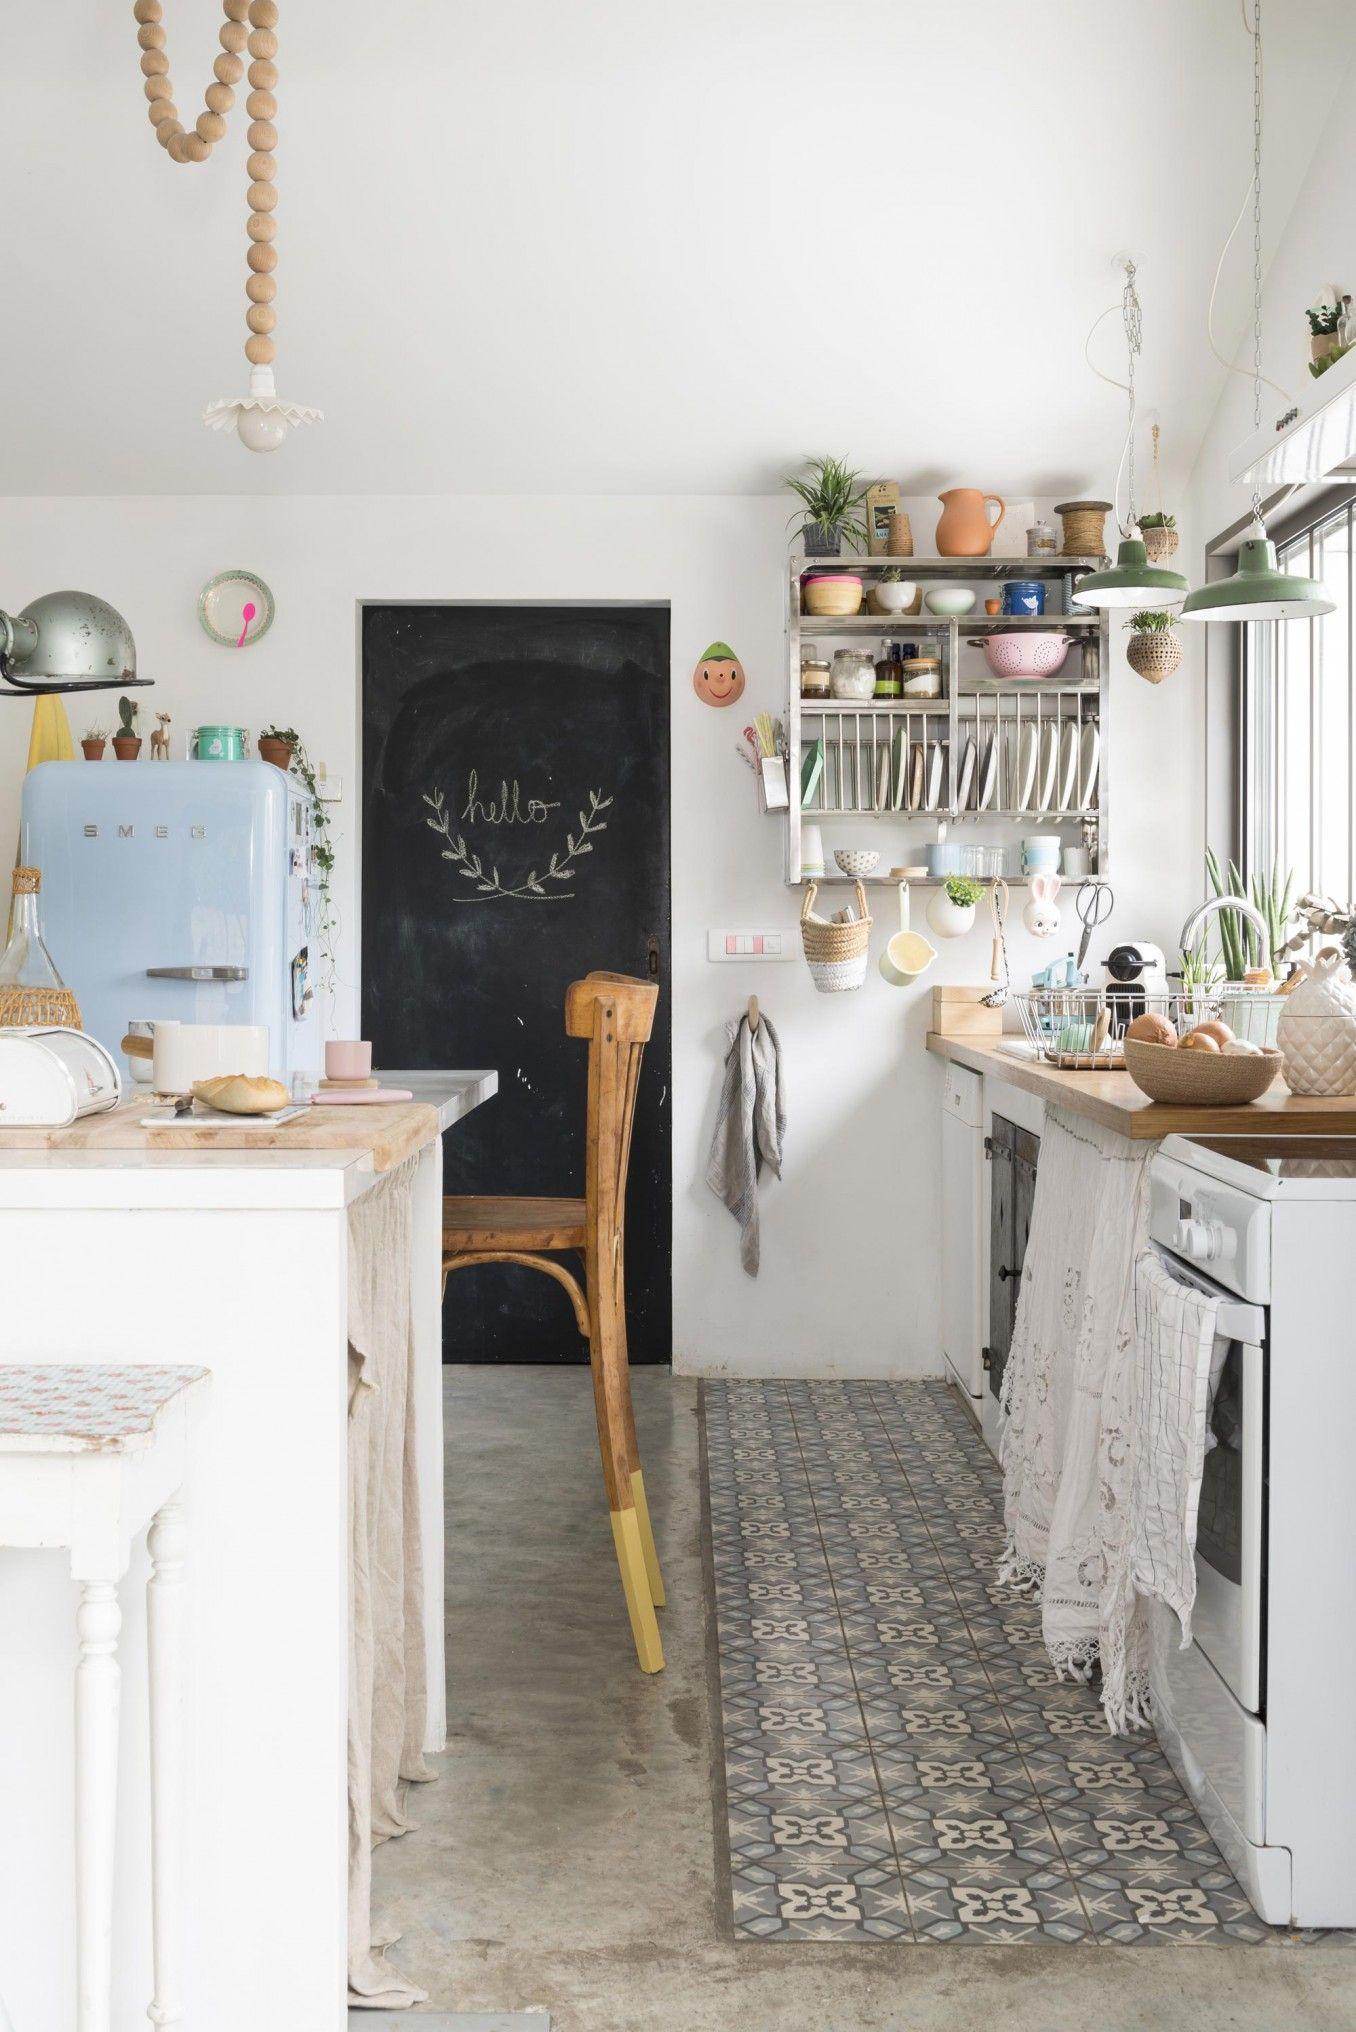 blackboard in the kitchen | {kitchen dreams} | Pinterest | Jogger ...